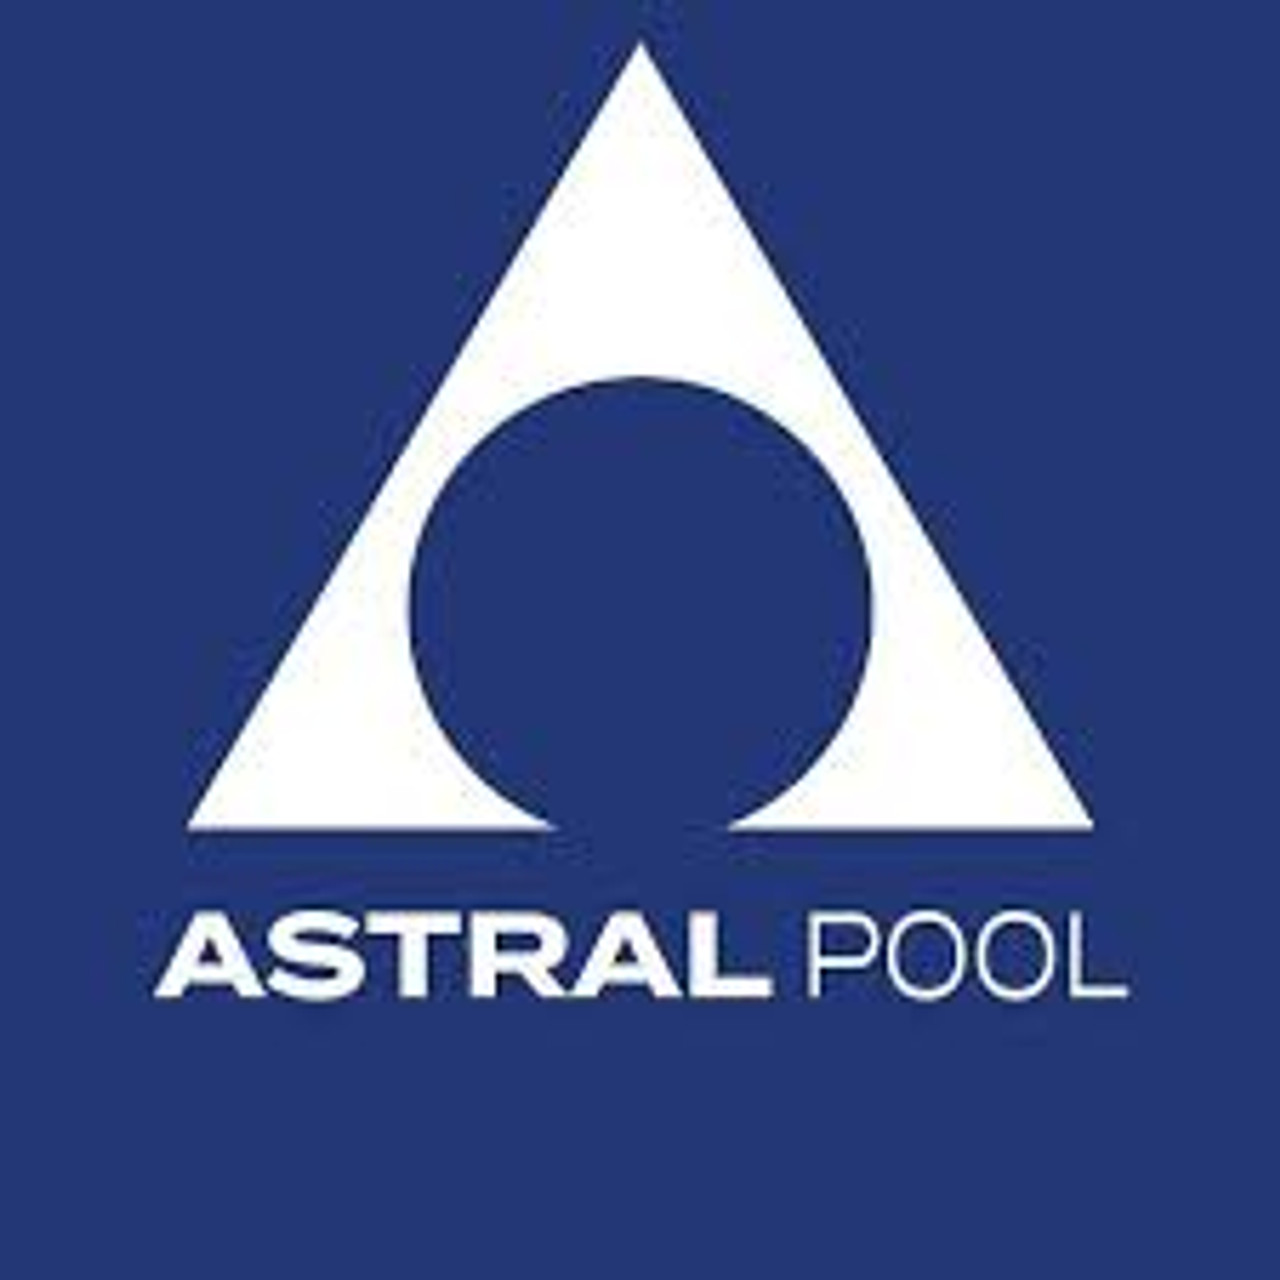 Astral pool logo